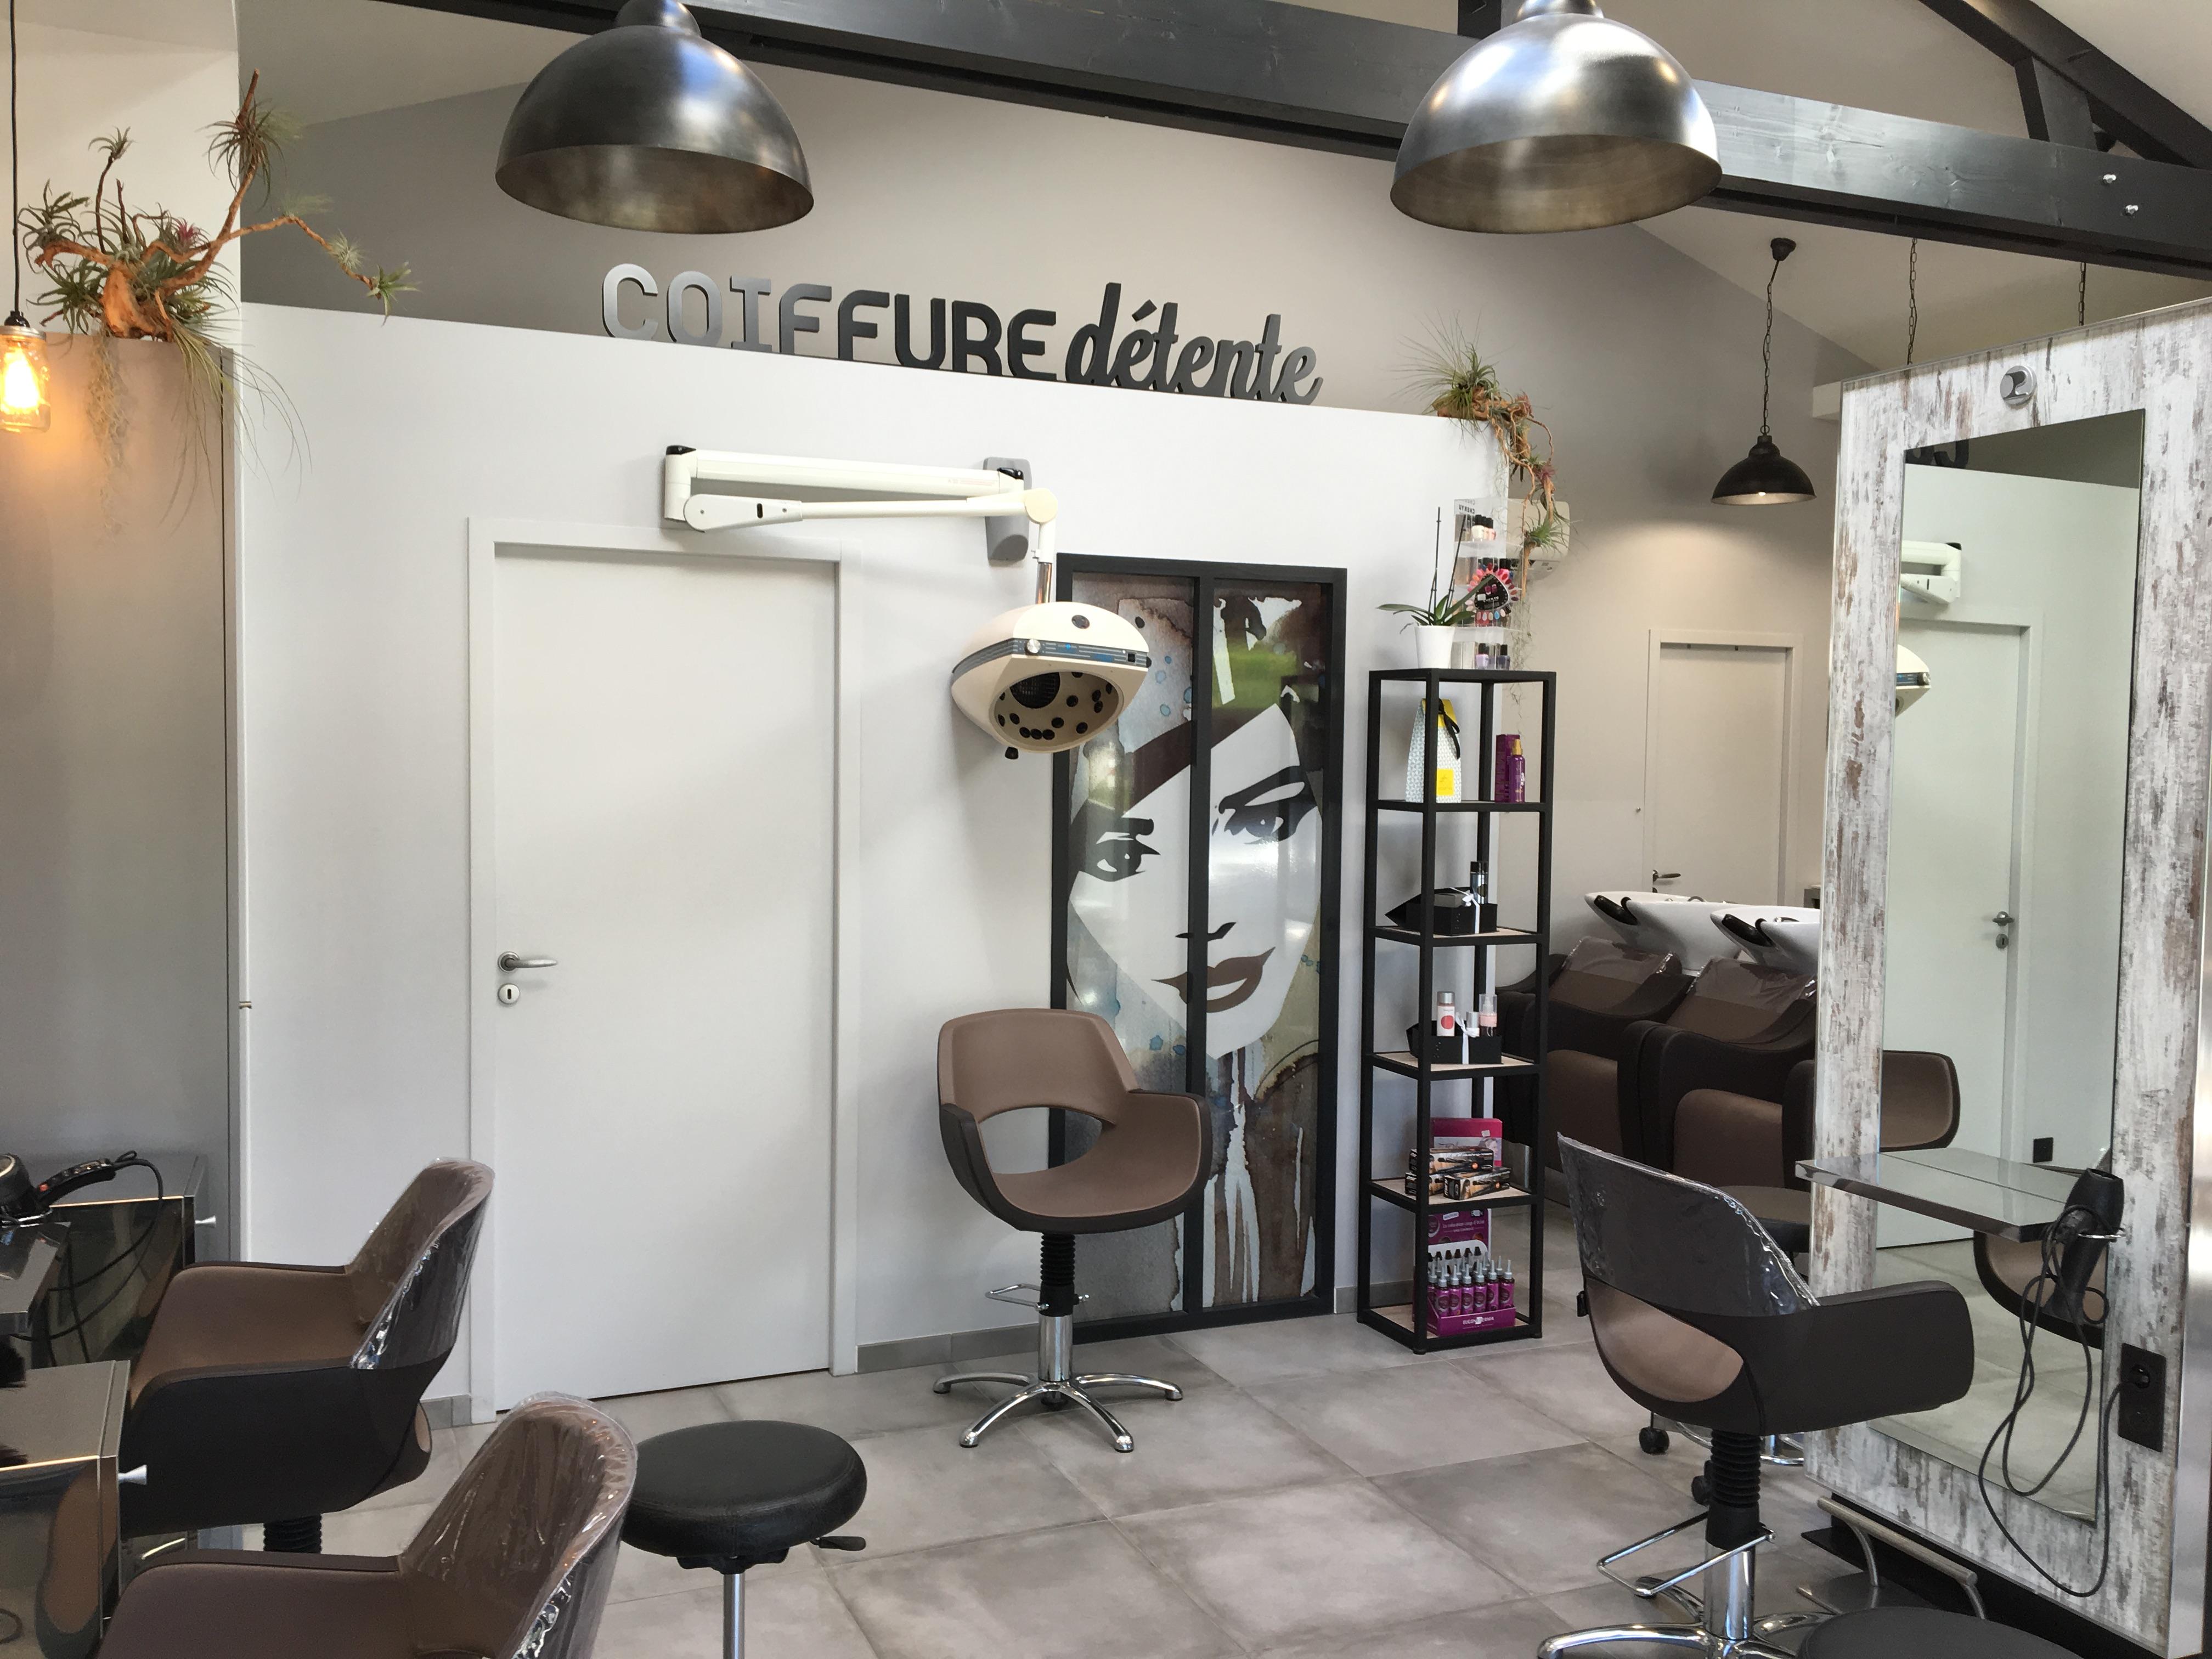 Salon coiffure atelier tendance - 8 - geraldine fourny - decoratrice - Nantes - 44